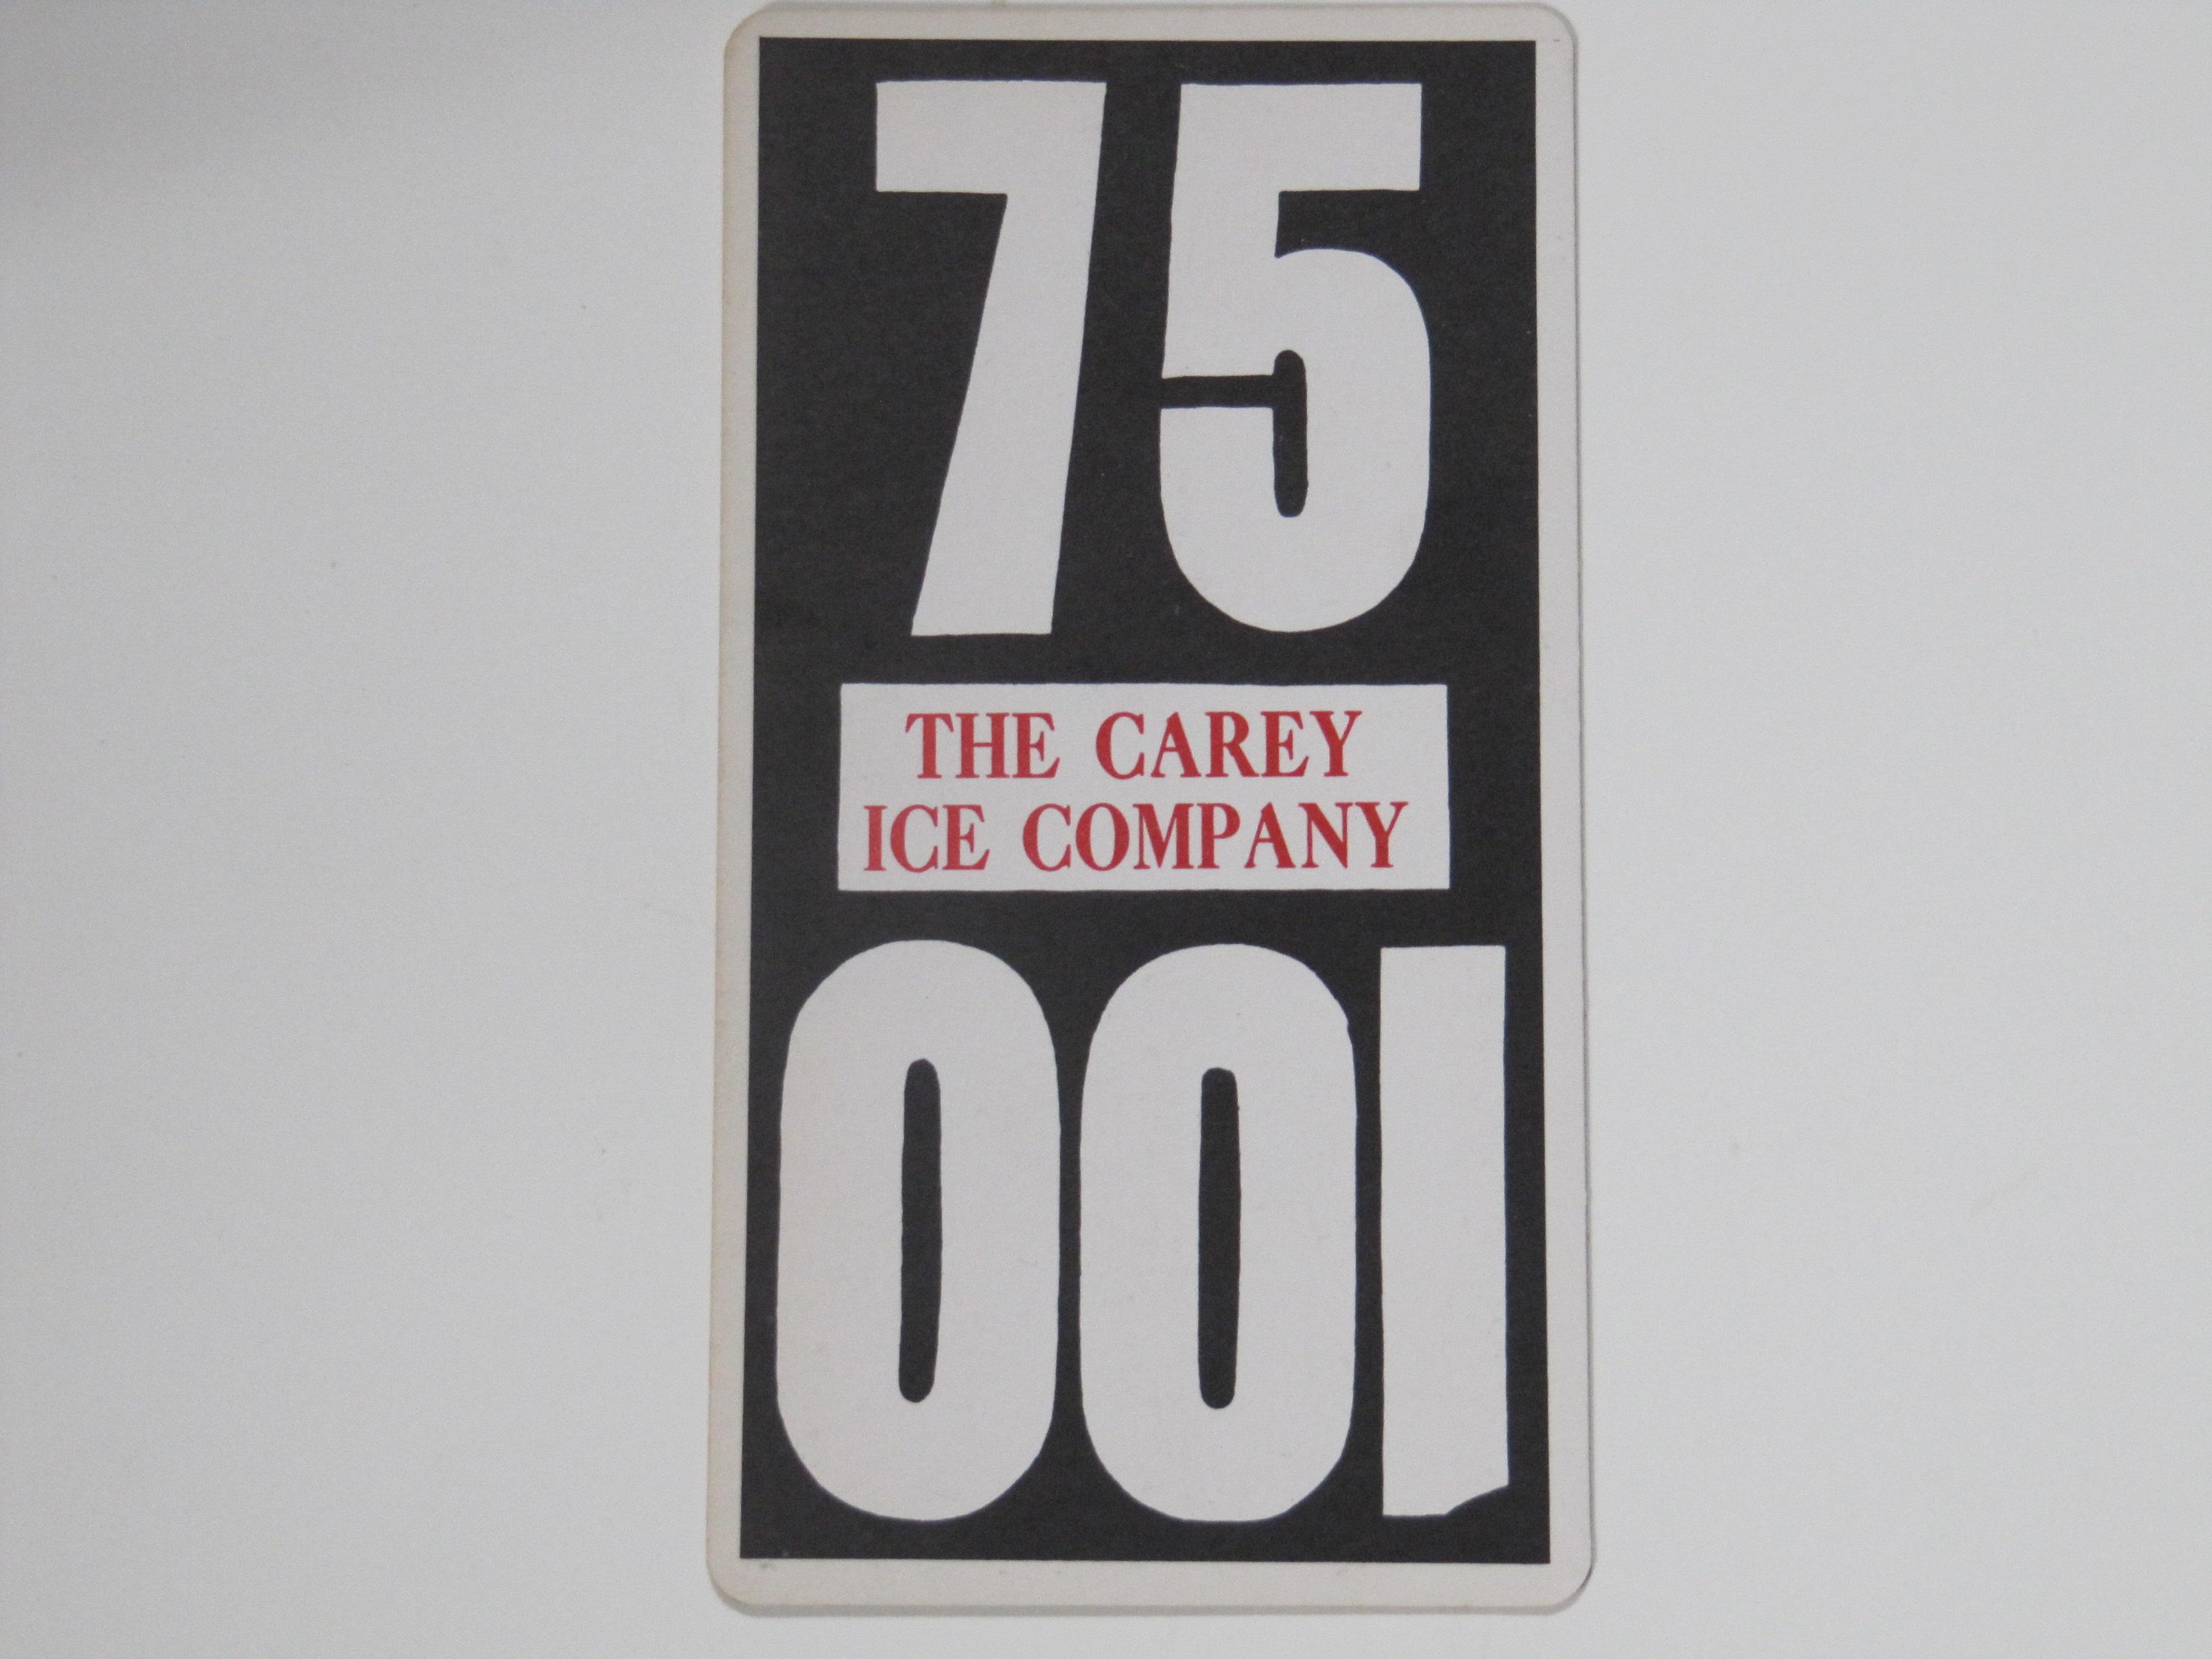 Carey Ice Co.